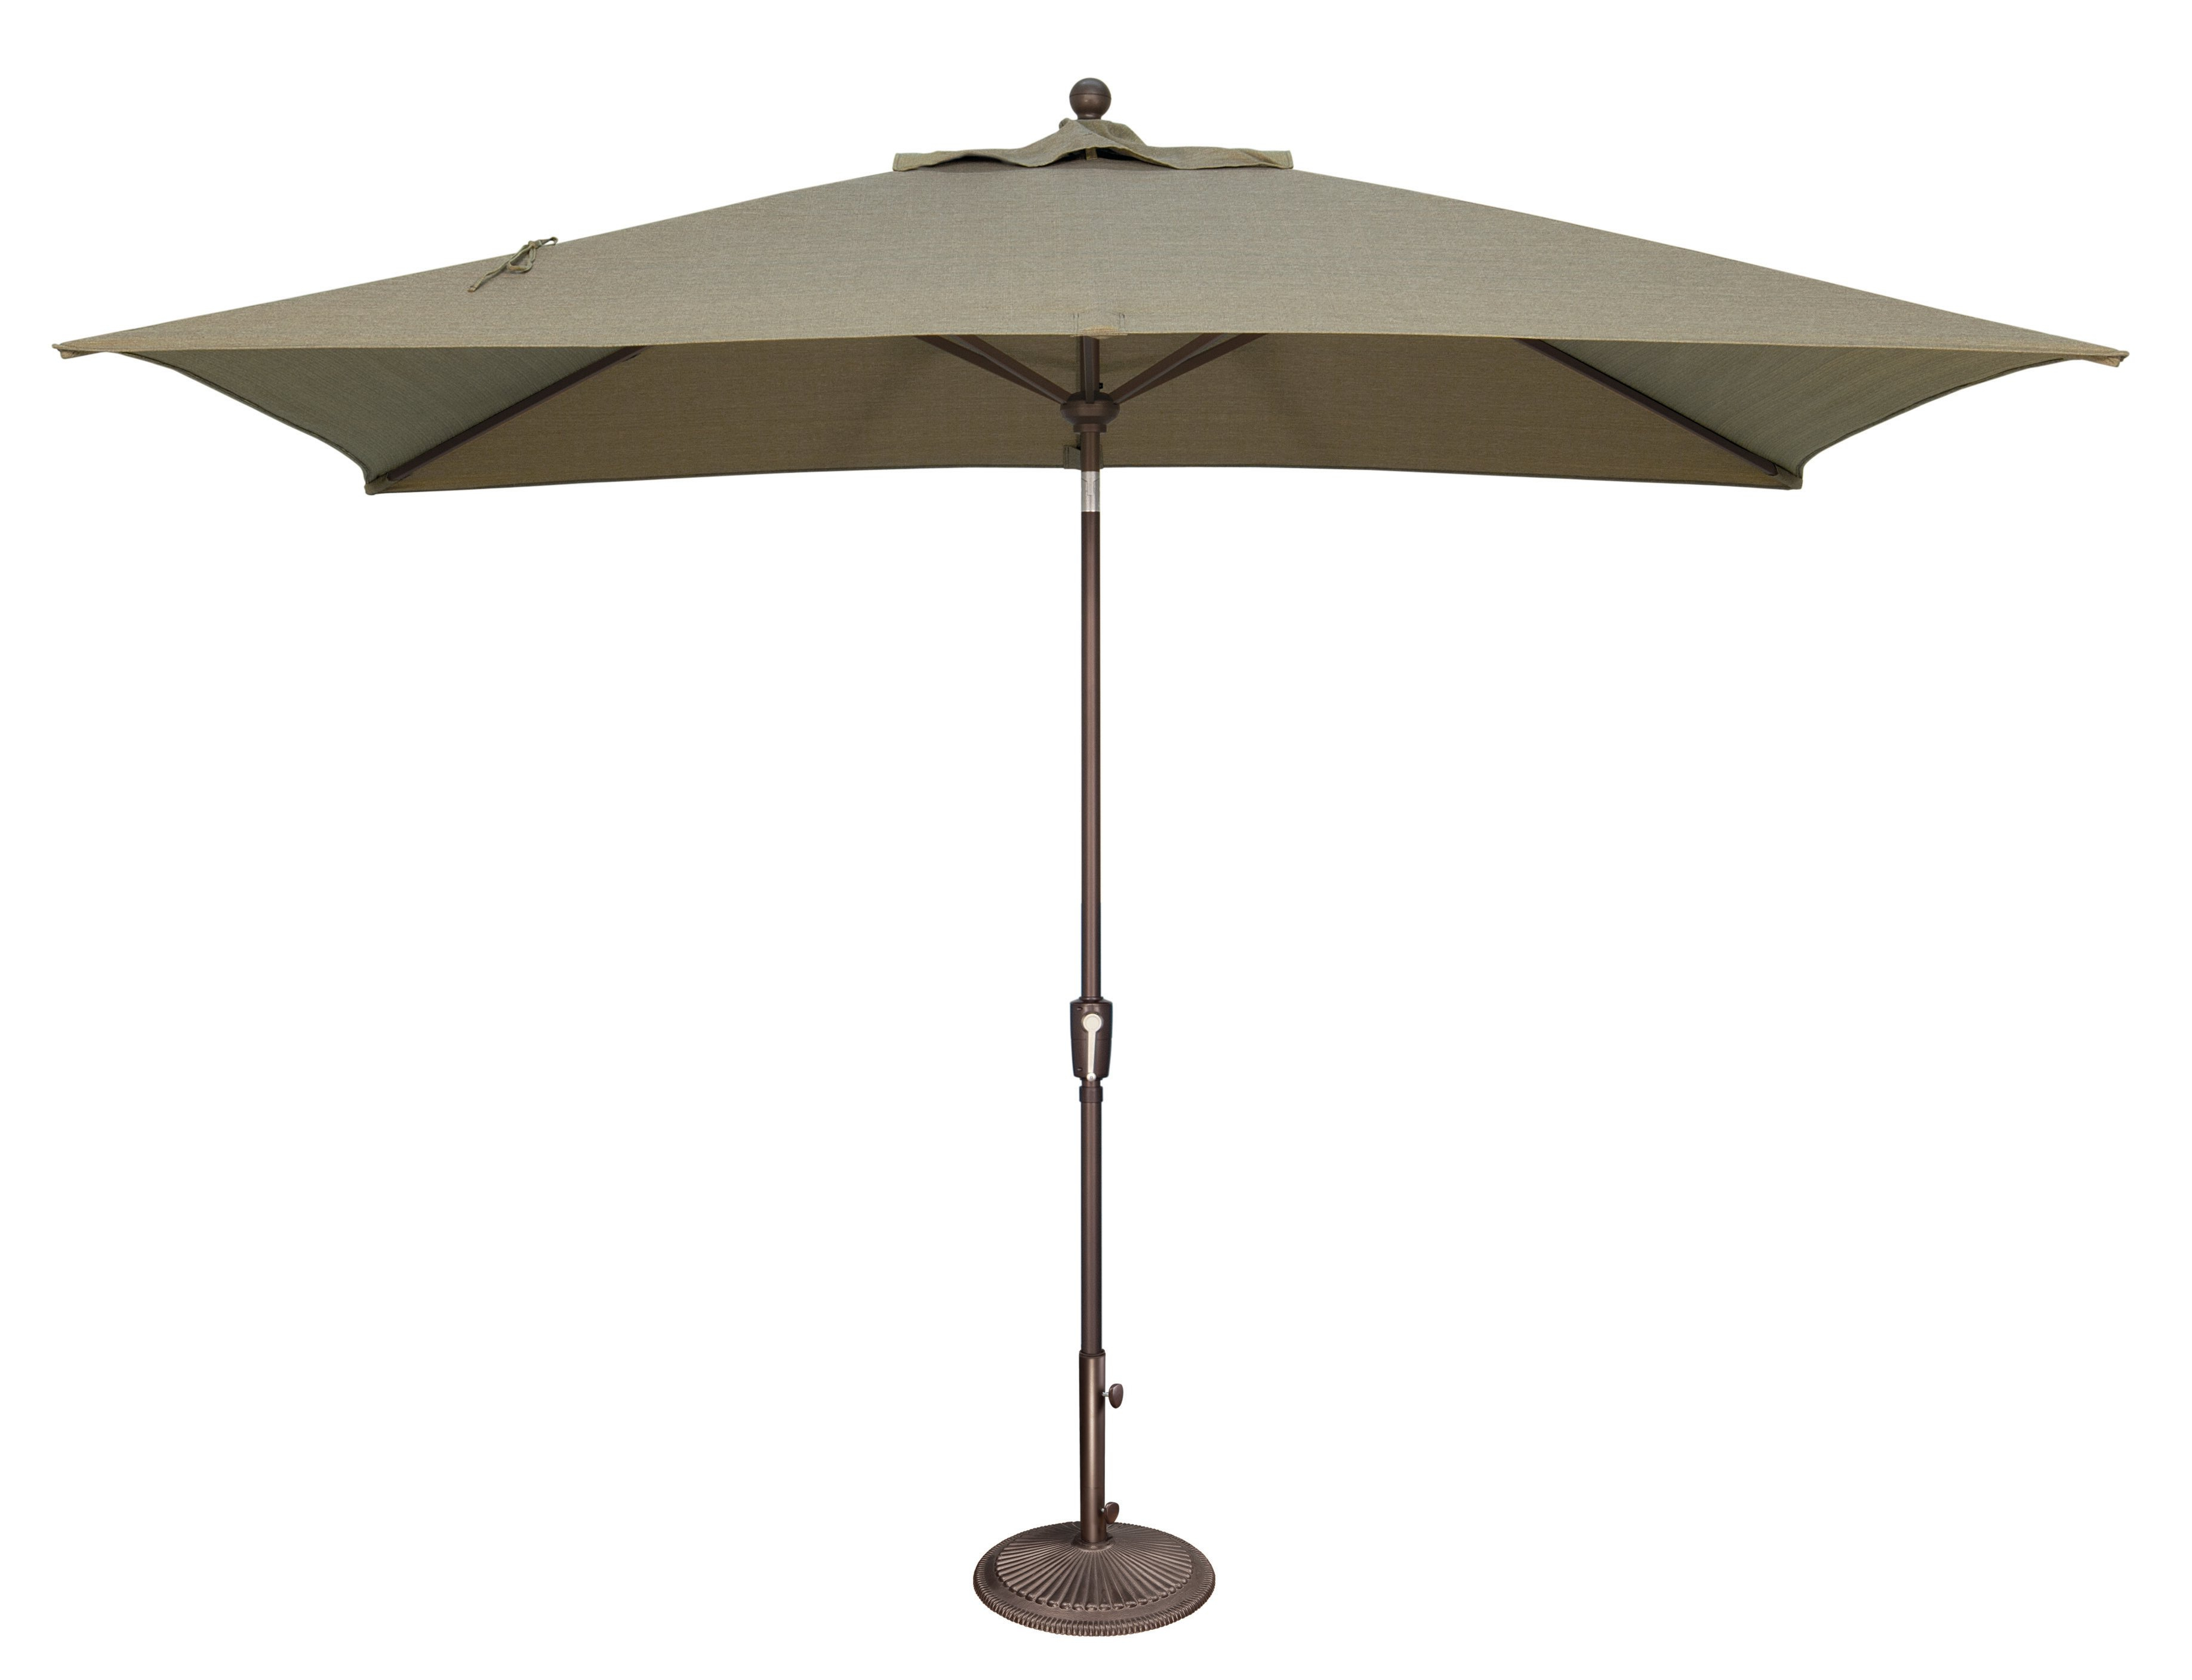 Mcdougal Market Umbrellas Within Most Current Launceston 10' X 6.5' Rectangular Market Umbrella (Gallery 14 of 20)